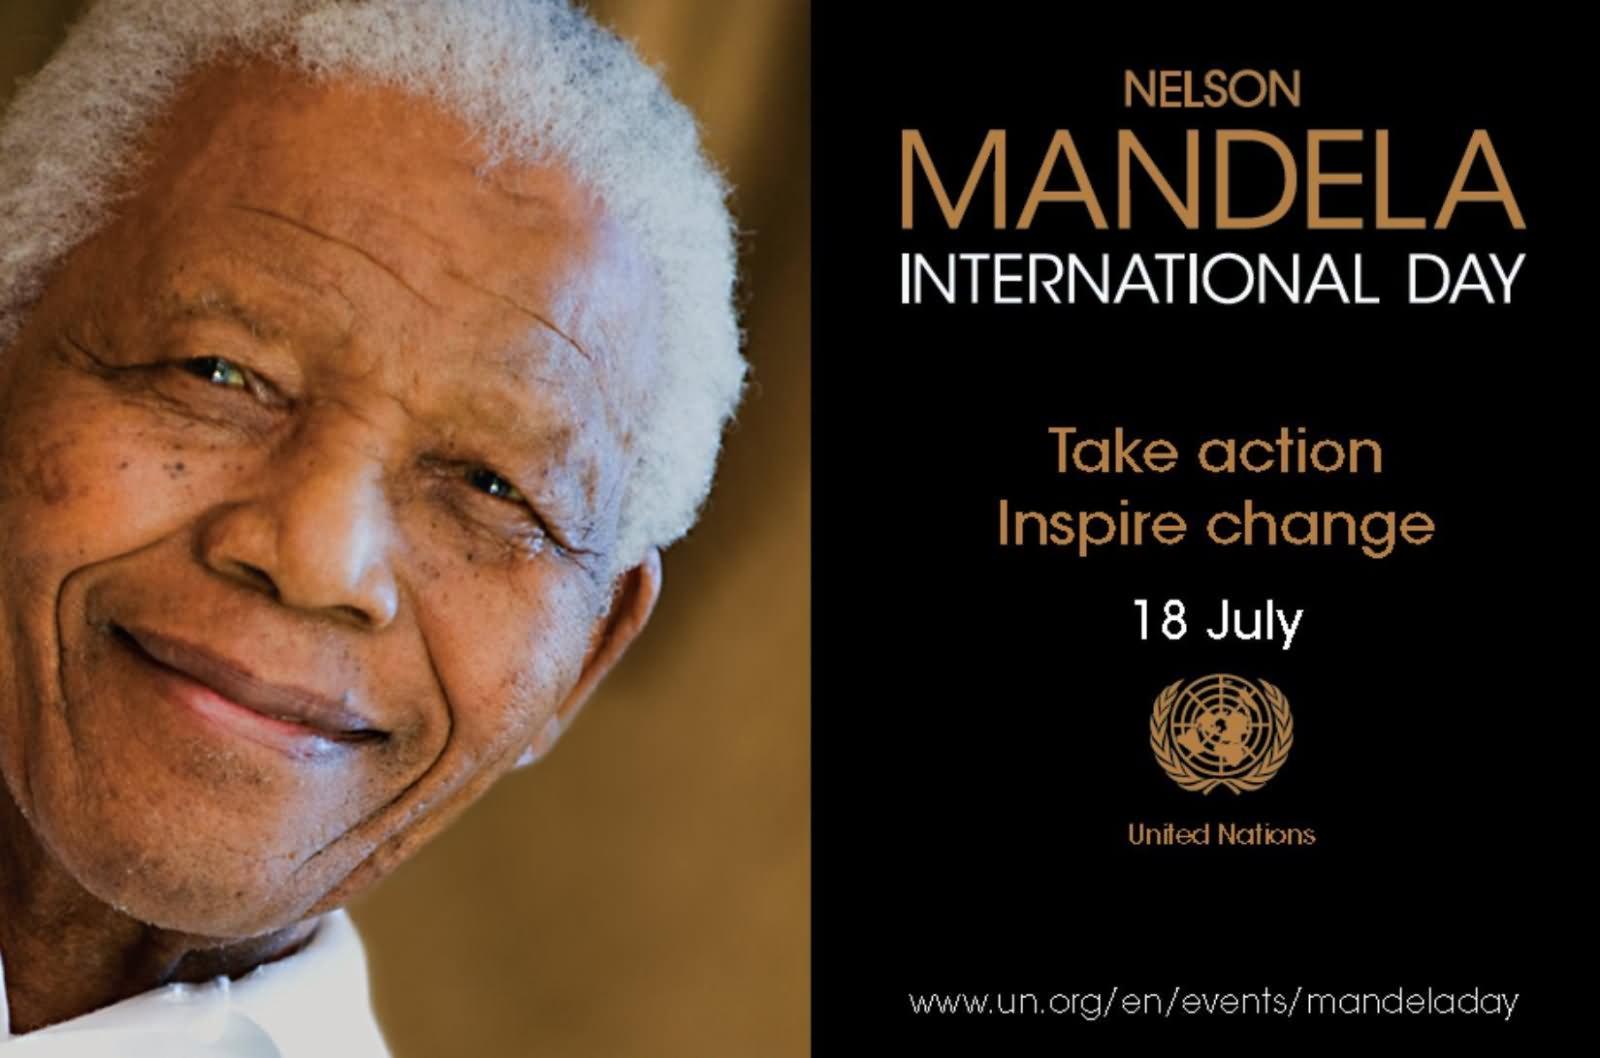 Nelson mandela international day take action inspire change 18 july